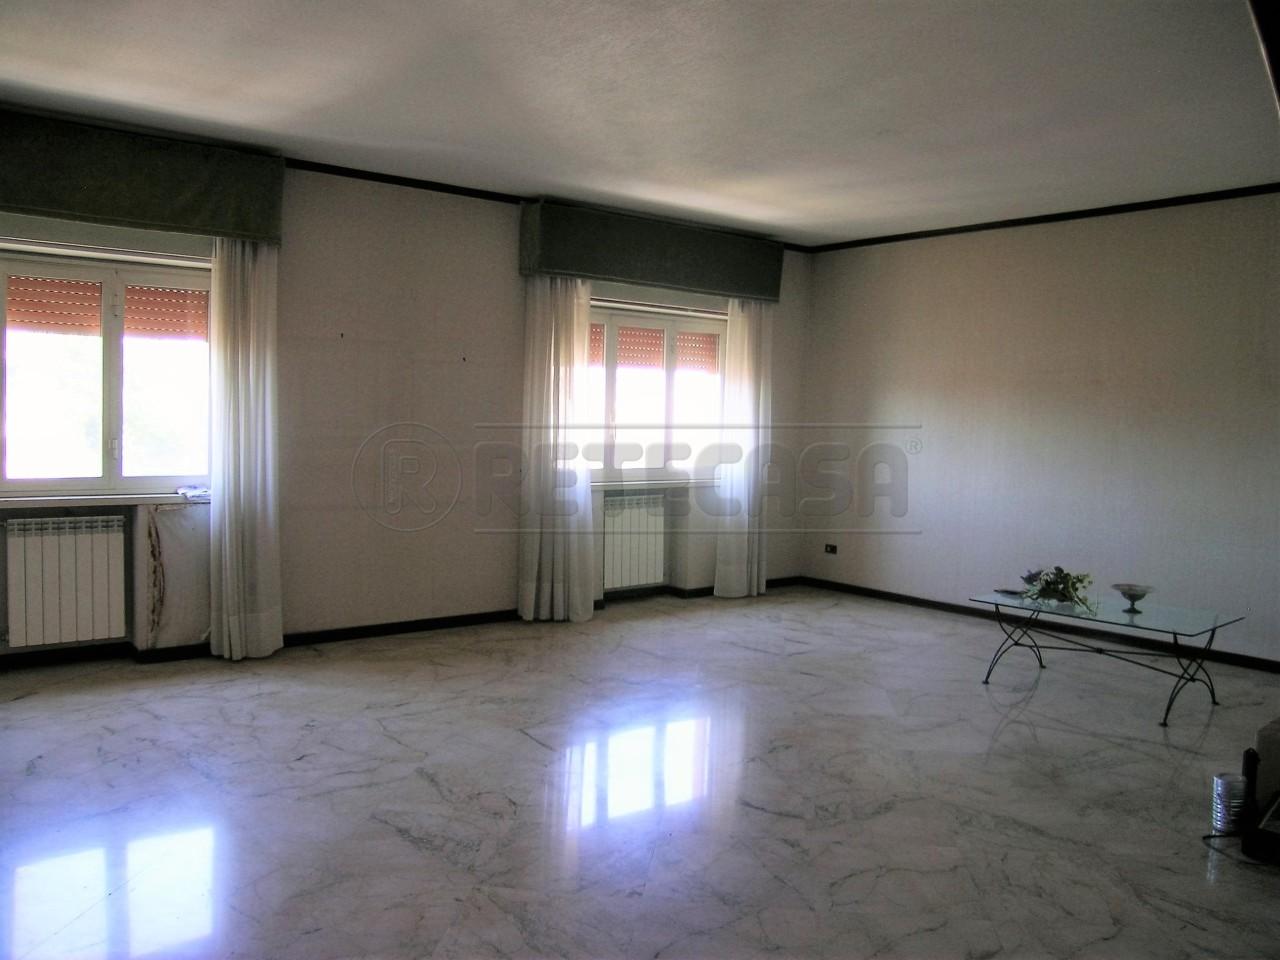 Appartamento, 177 Mq, Vendita - Caltanissetta